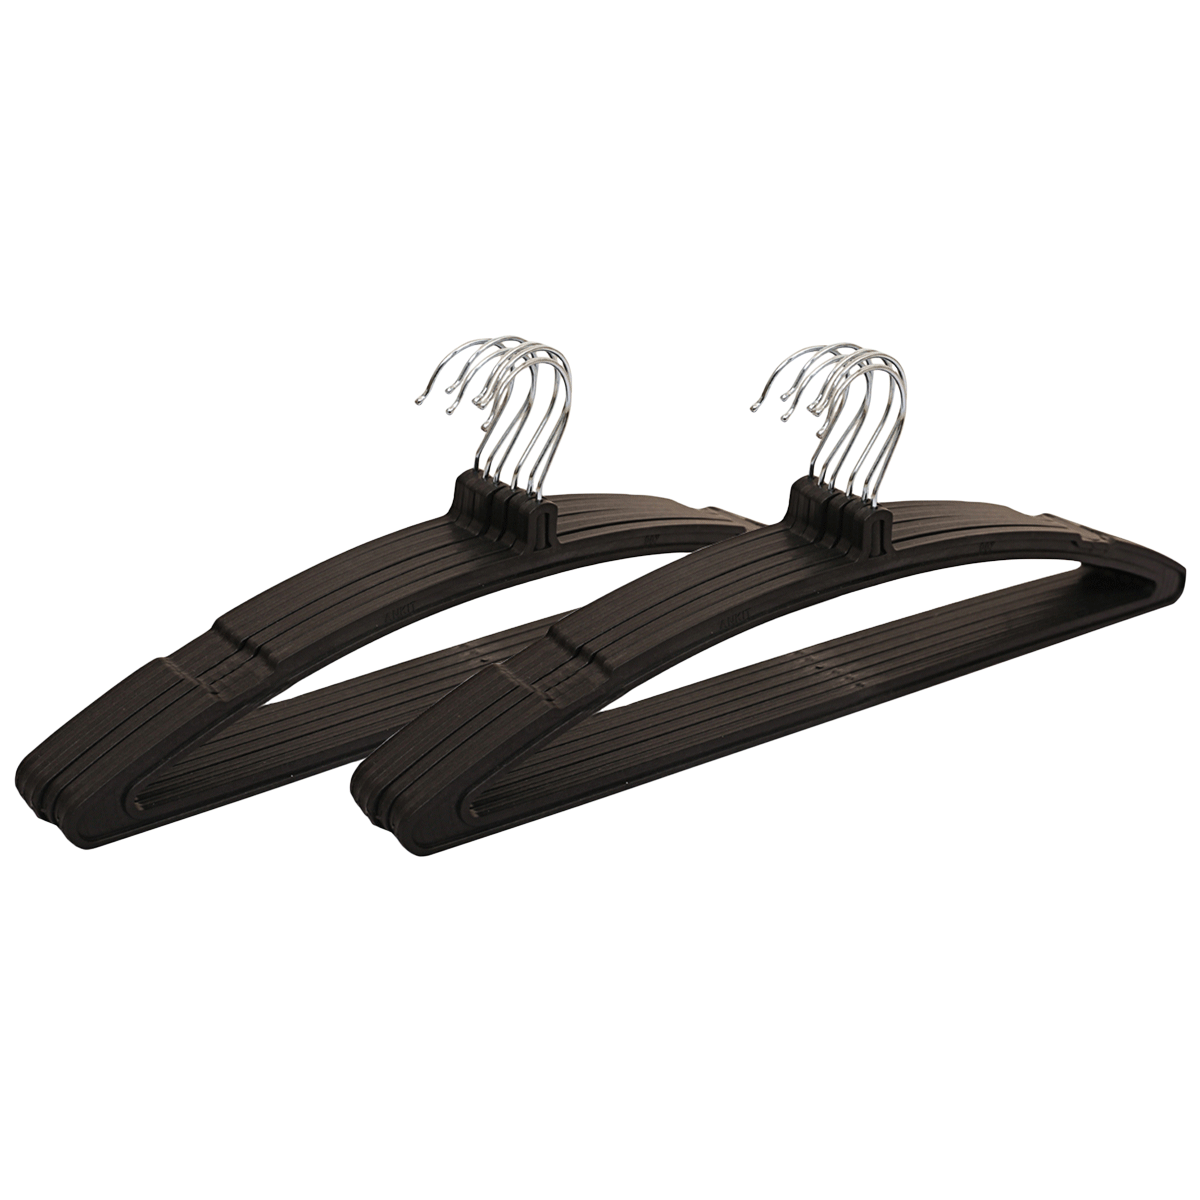 Kuber Industries Plastic 12 Pieces Hangers (Ultra-slim Profile, CTHANG006, Black)_1